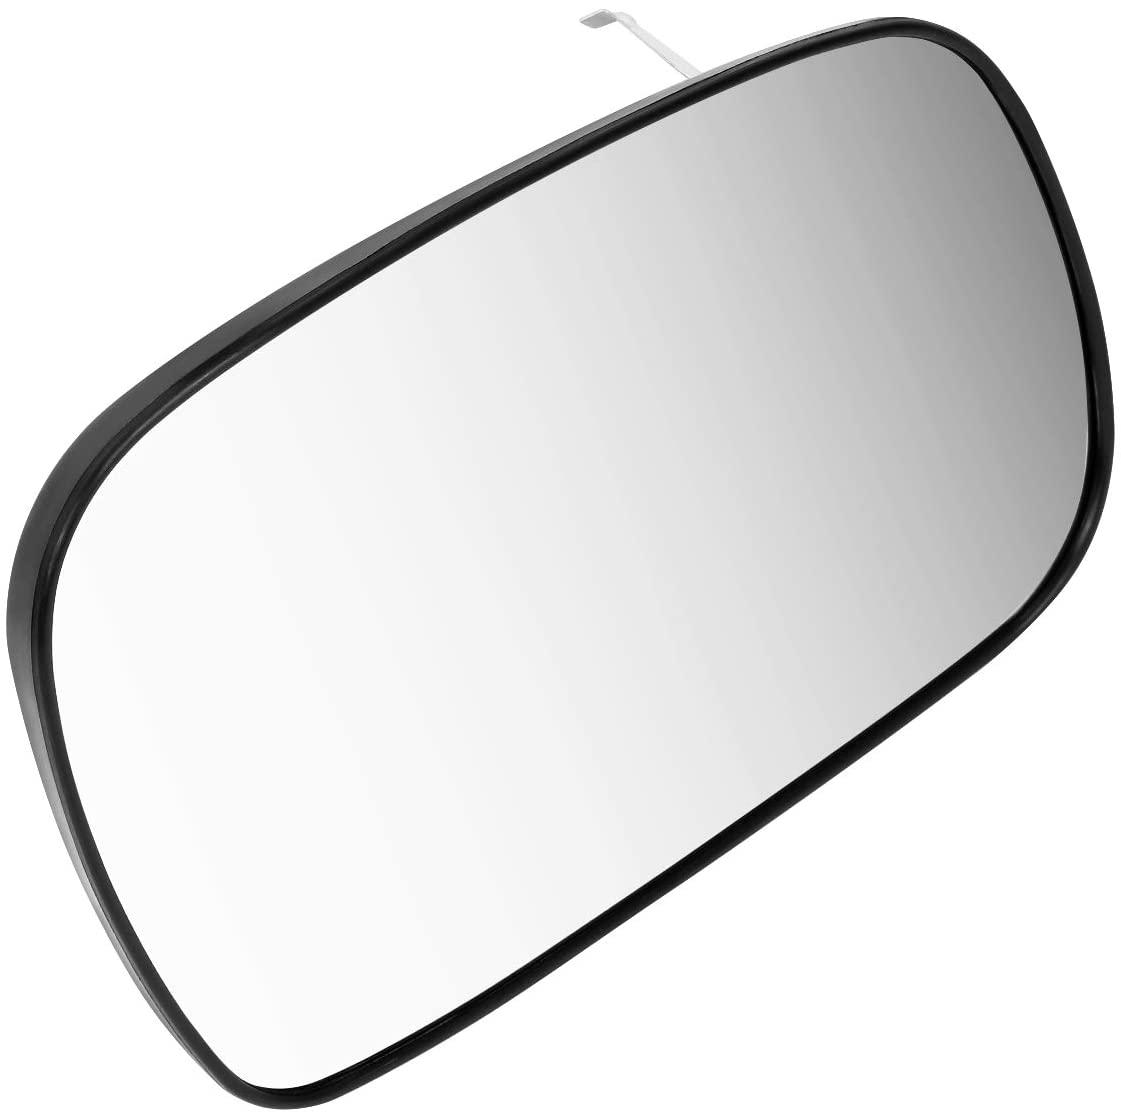 DNA Motoring OEM-MG-0327 76203SVAA11 OE Style Passenger/Right Mirror Glass